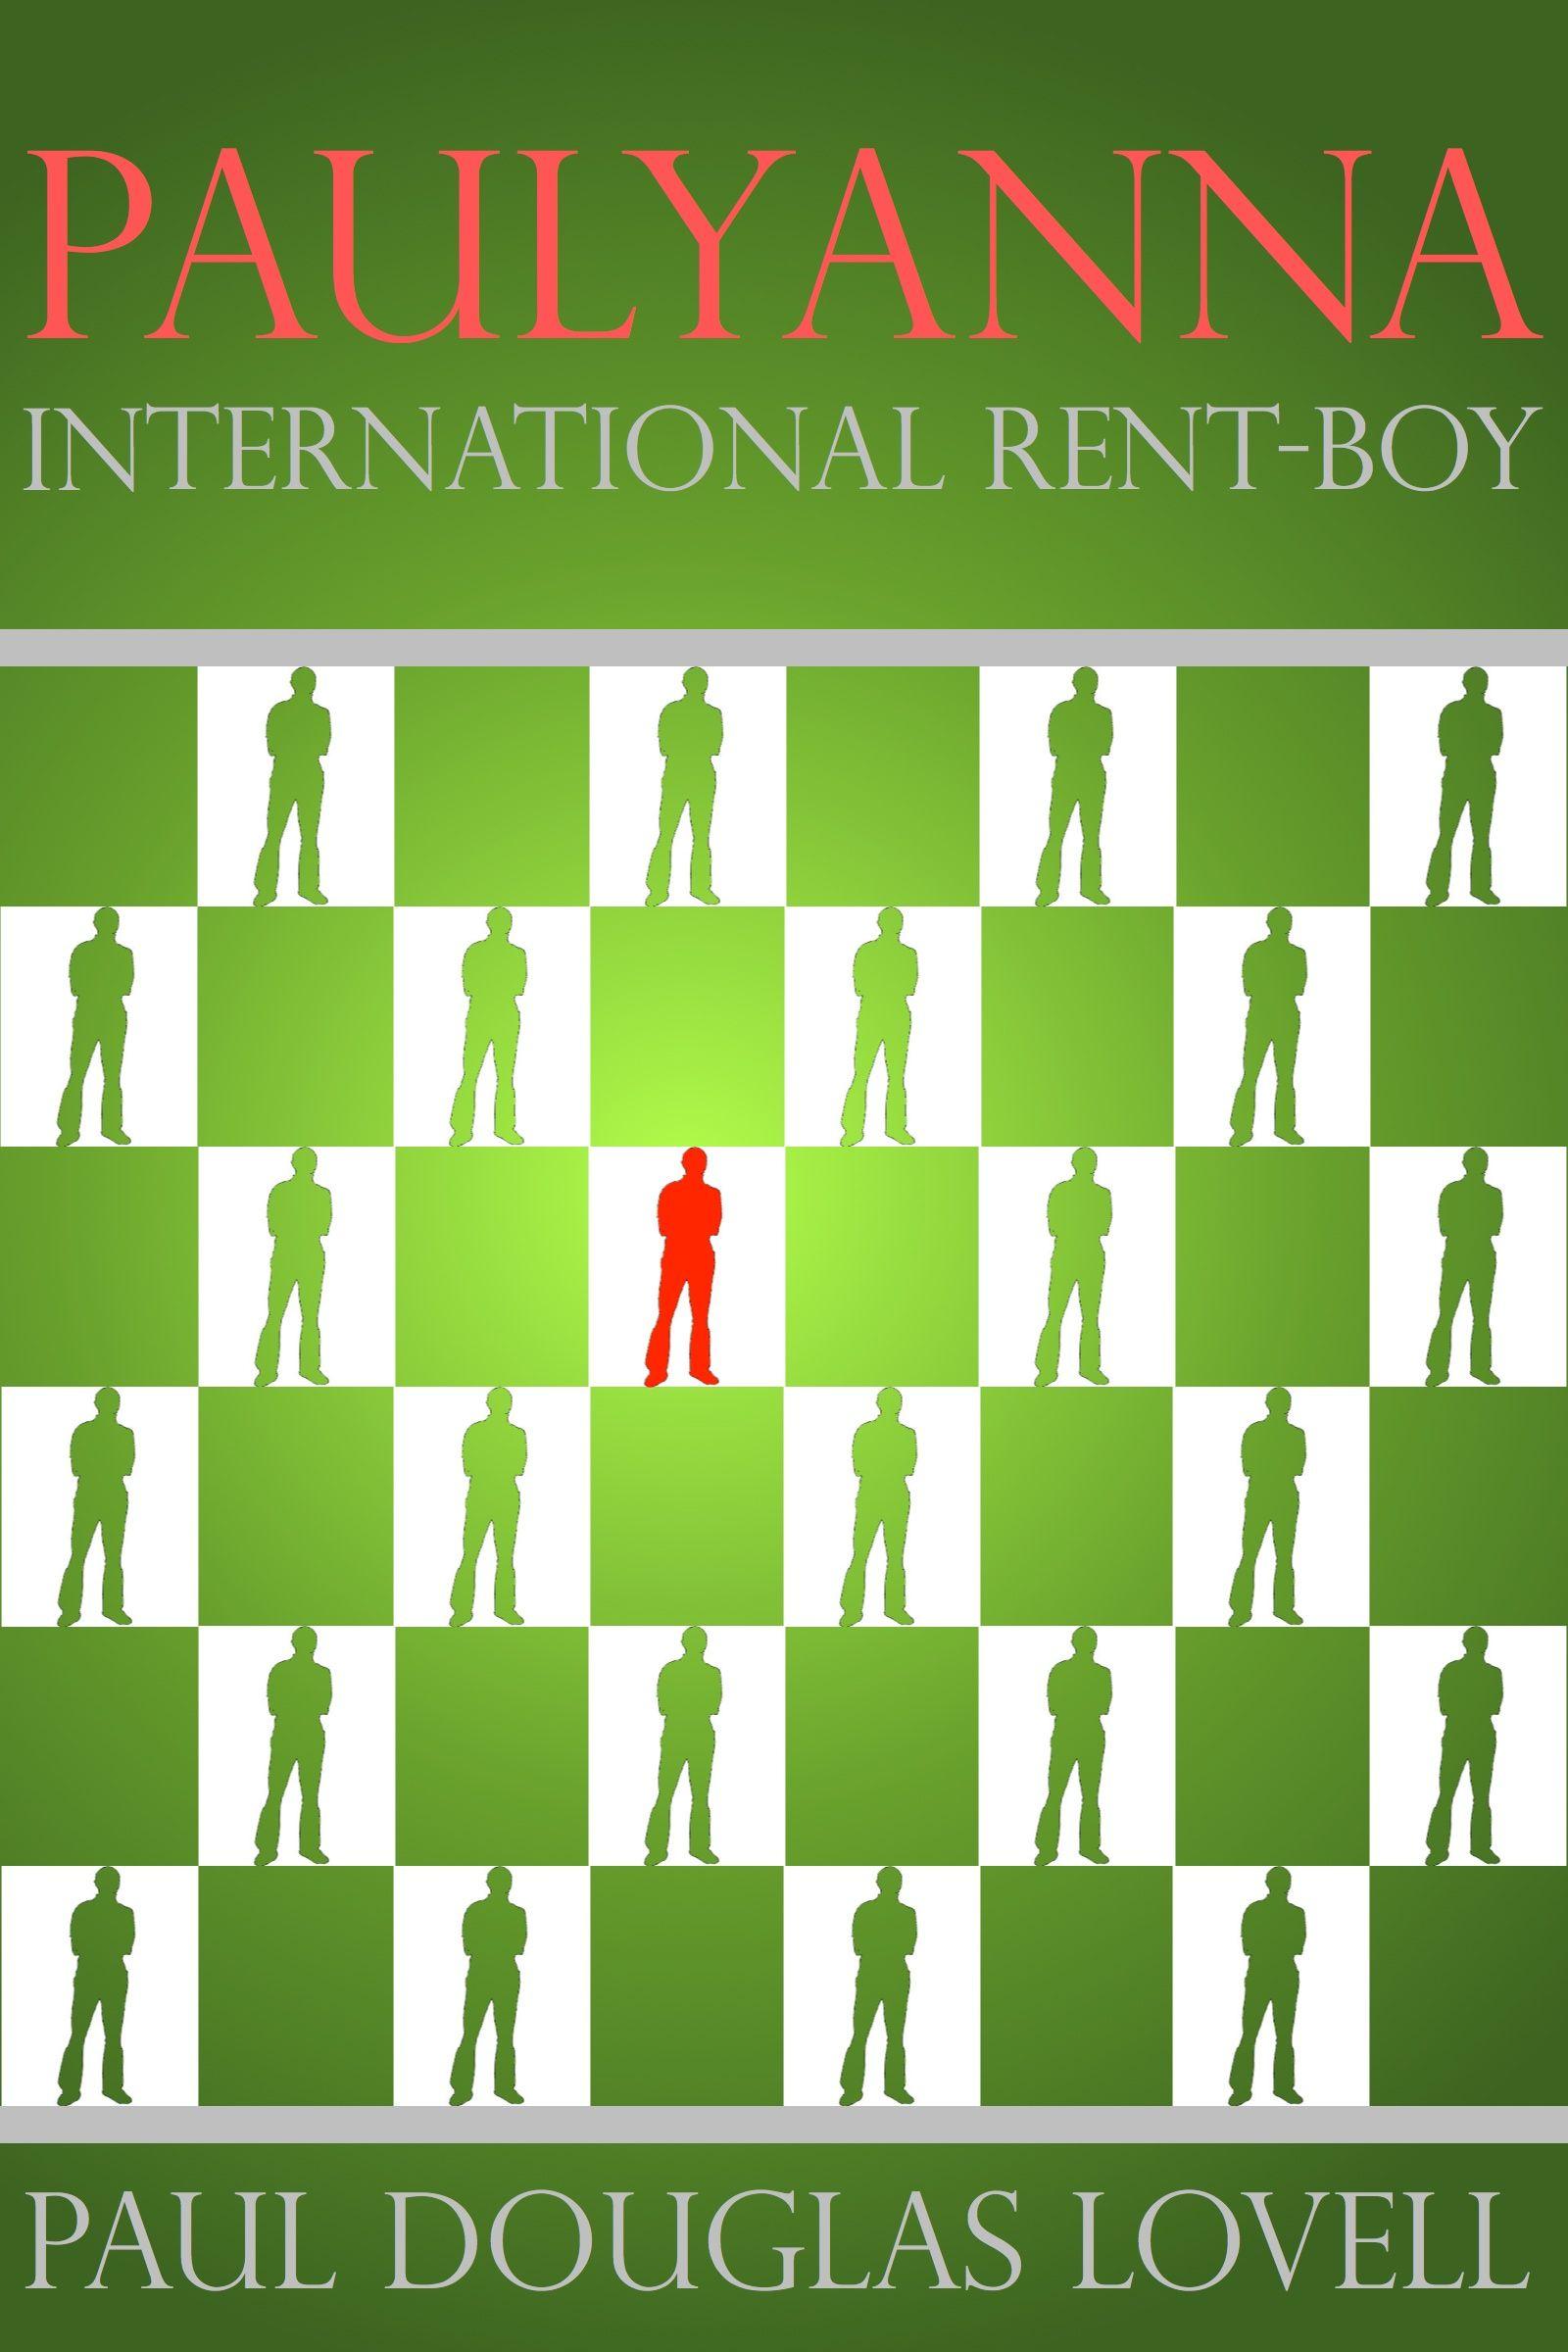 Paulyanna International Rent-boy's Ebook Image